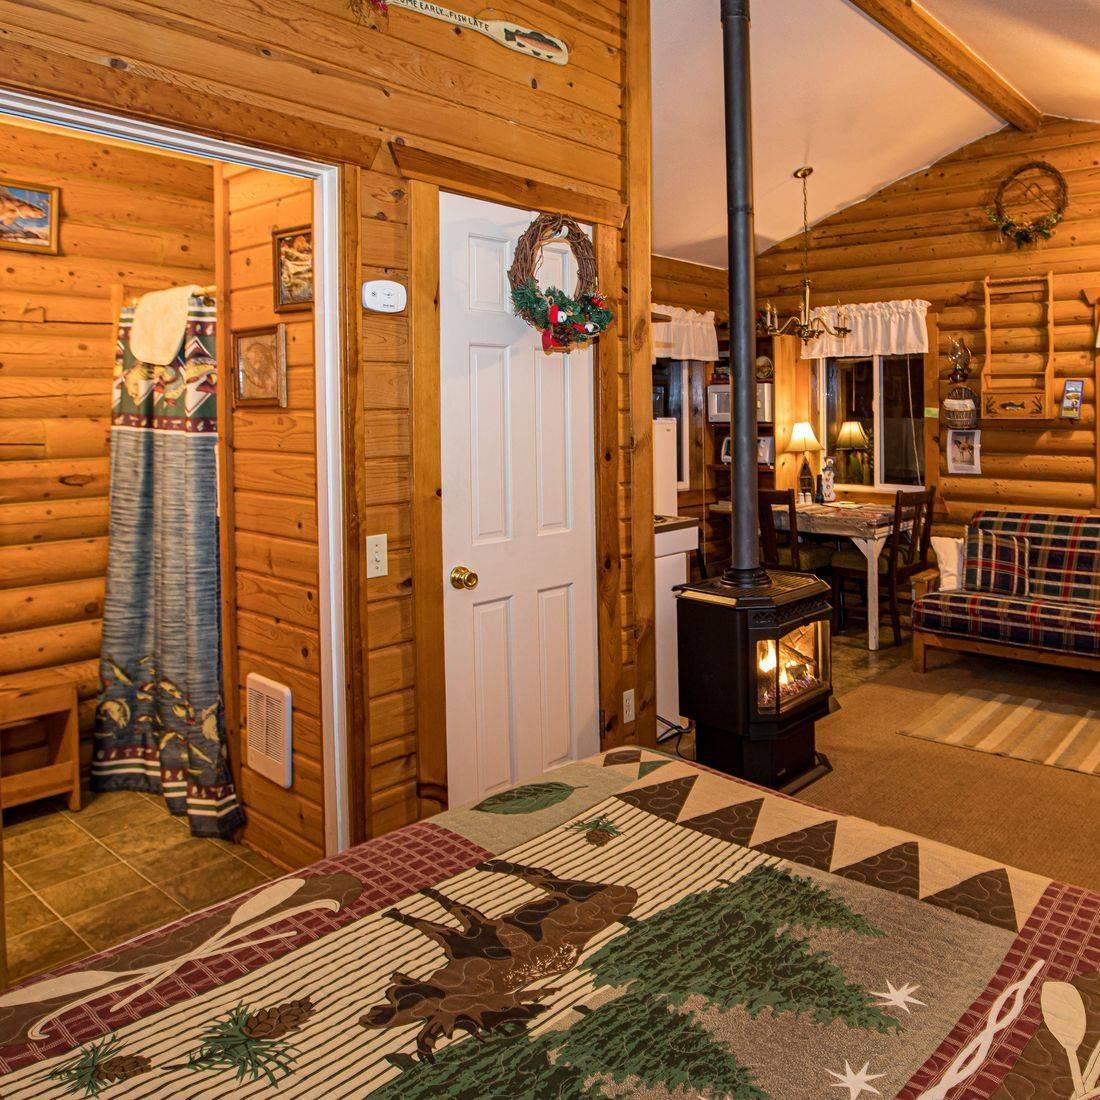 Log cabins, lodging, hotels, North Cascades